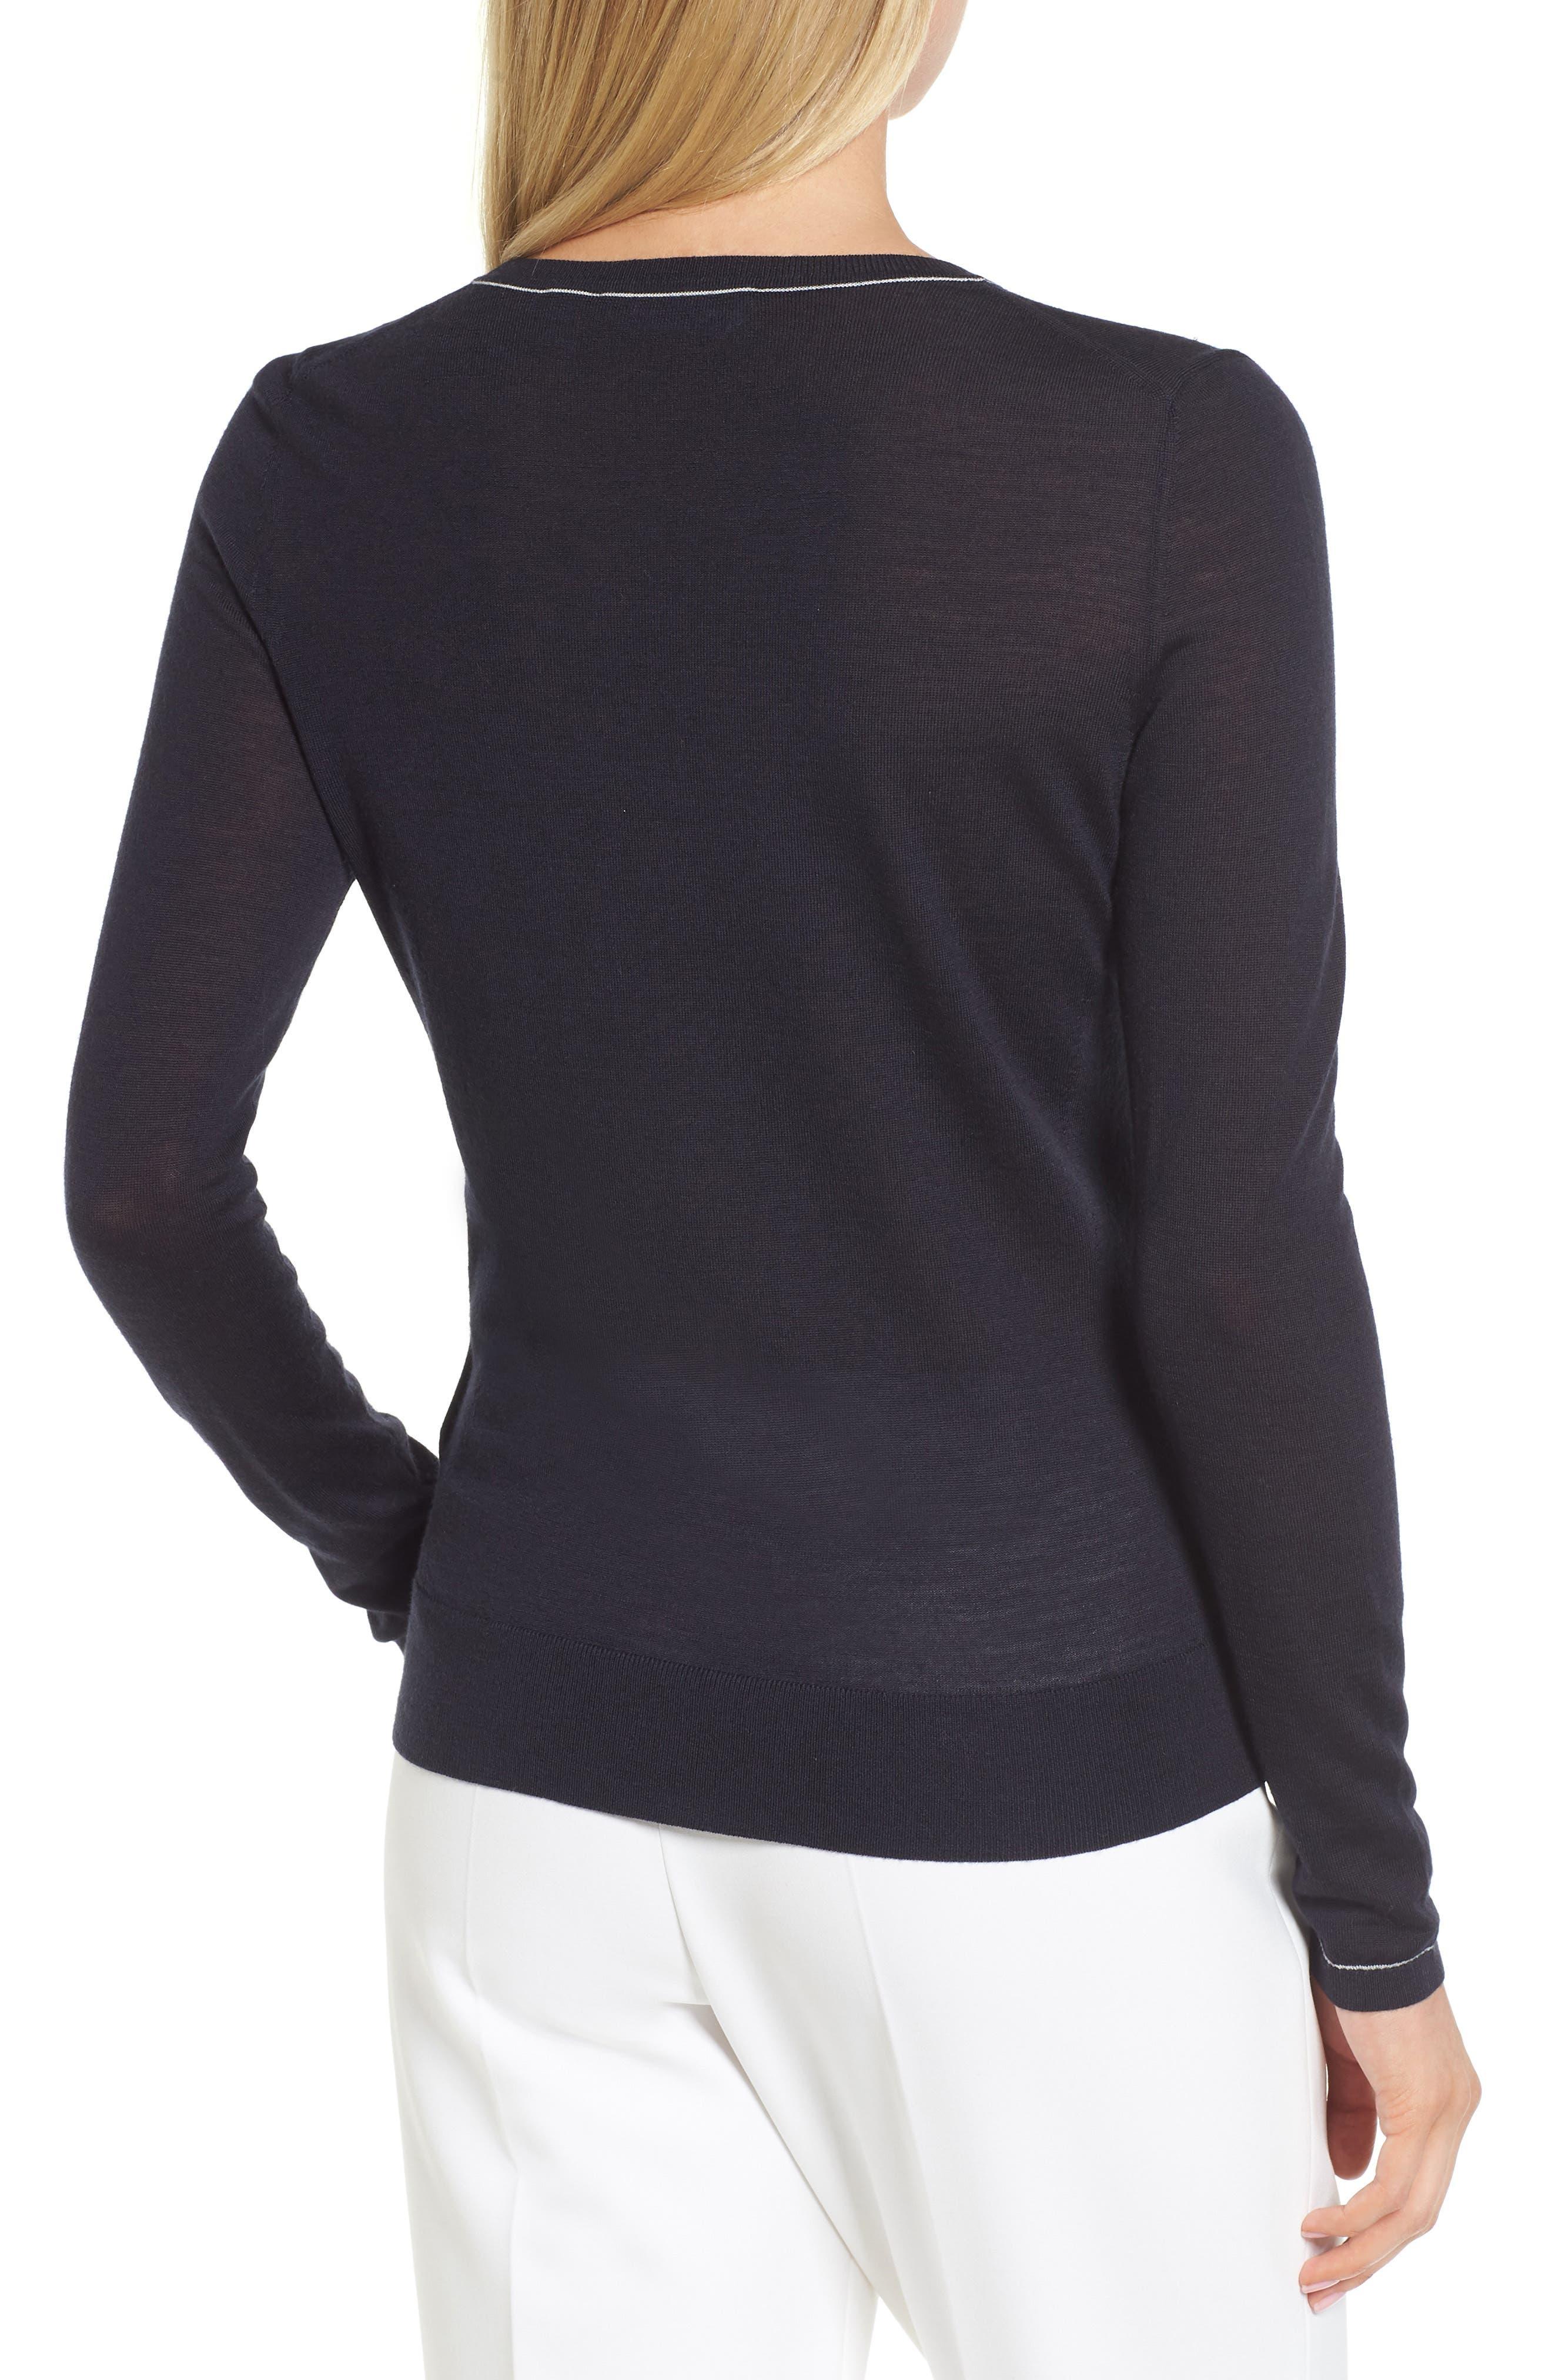 Femma Wool Sweater,                             Alternate thumbnail 2, color,                             Navy